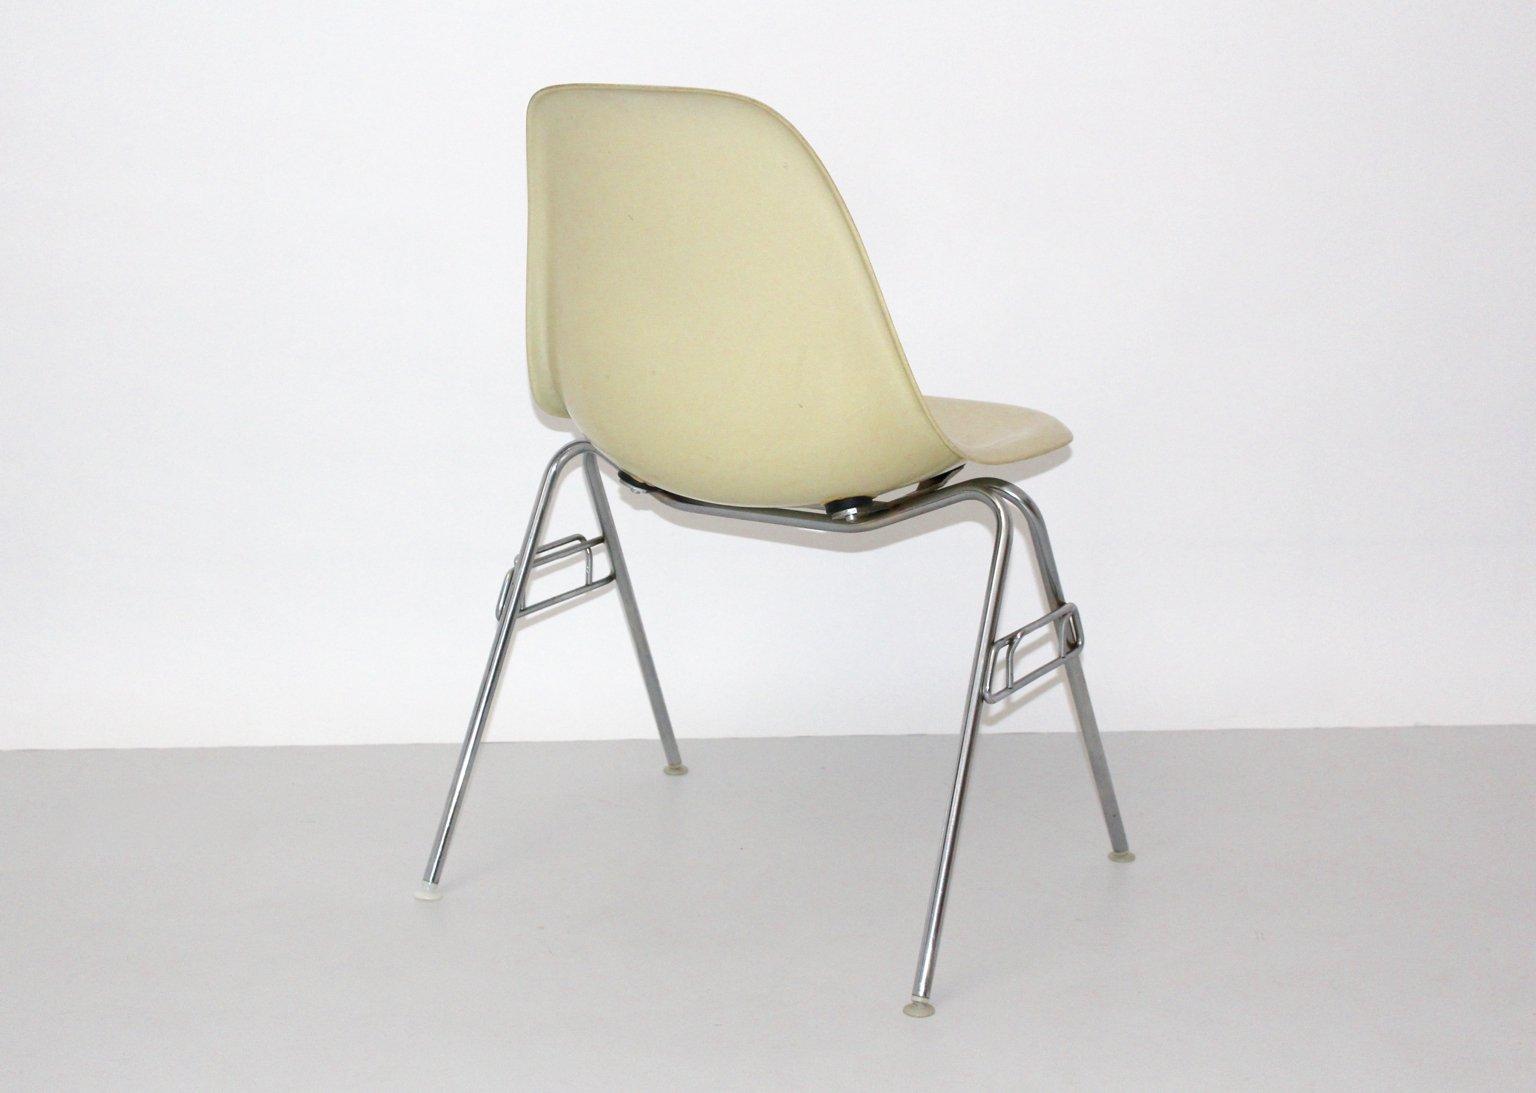 vintage model dss n fiberglas stuhl von ray charles eames f r herman miller bei pamono kaufen. Black Bedroom Furniture Sets. Home Design Ideas